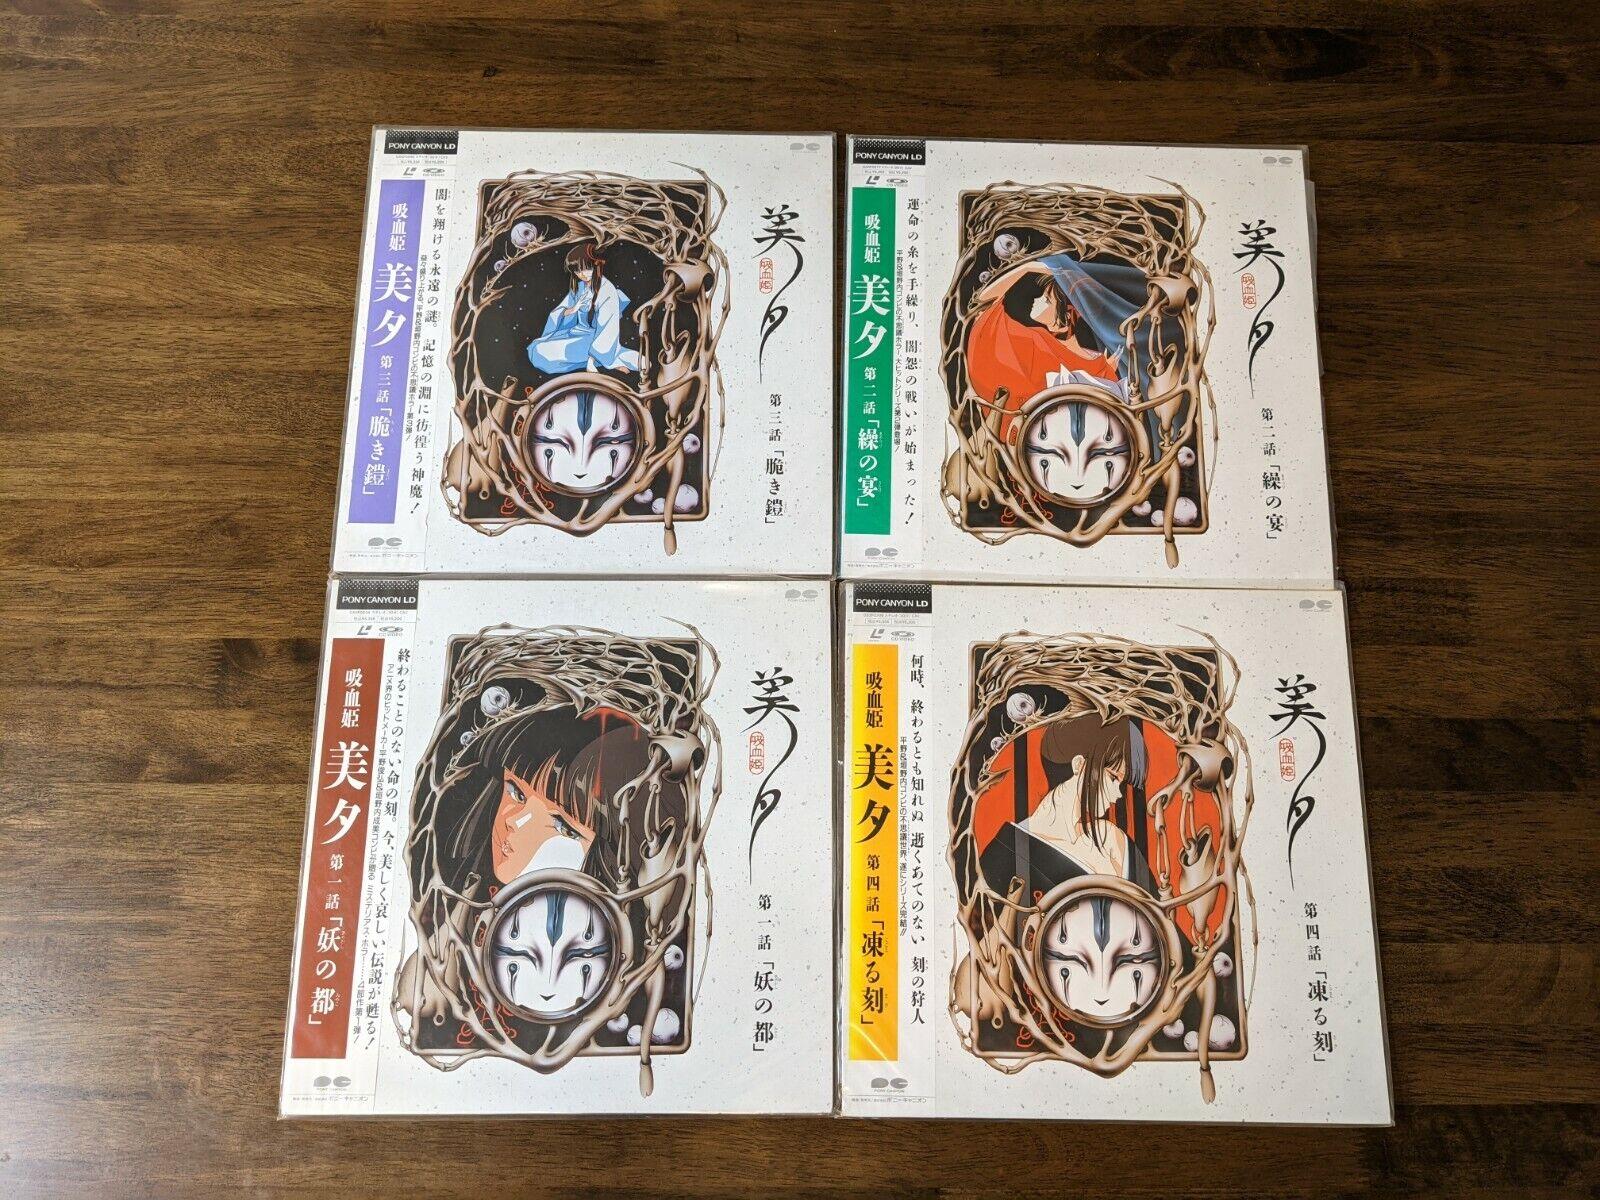 Vampire Princess Miyu Pristine Condition Anime 4-Set Laser Disc Free Shipping  - $50.00